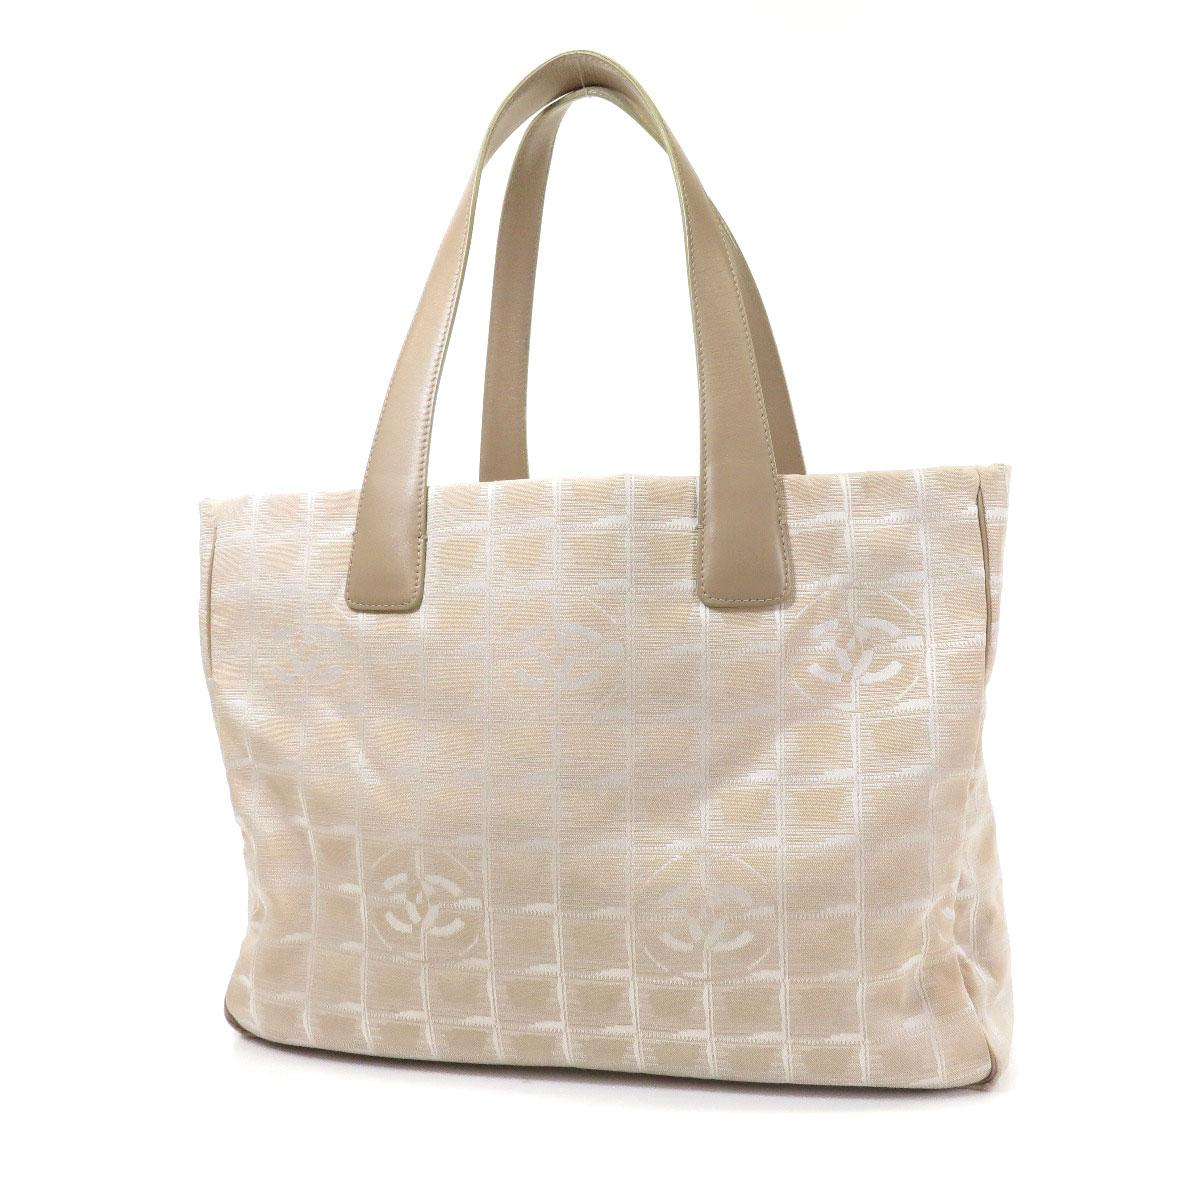 5719ec9623a CHANEL  CHANEL  Tote Bag Nylon Jacquard Ladies ー The best ...